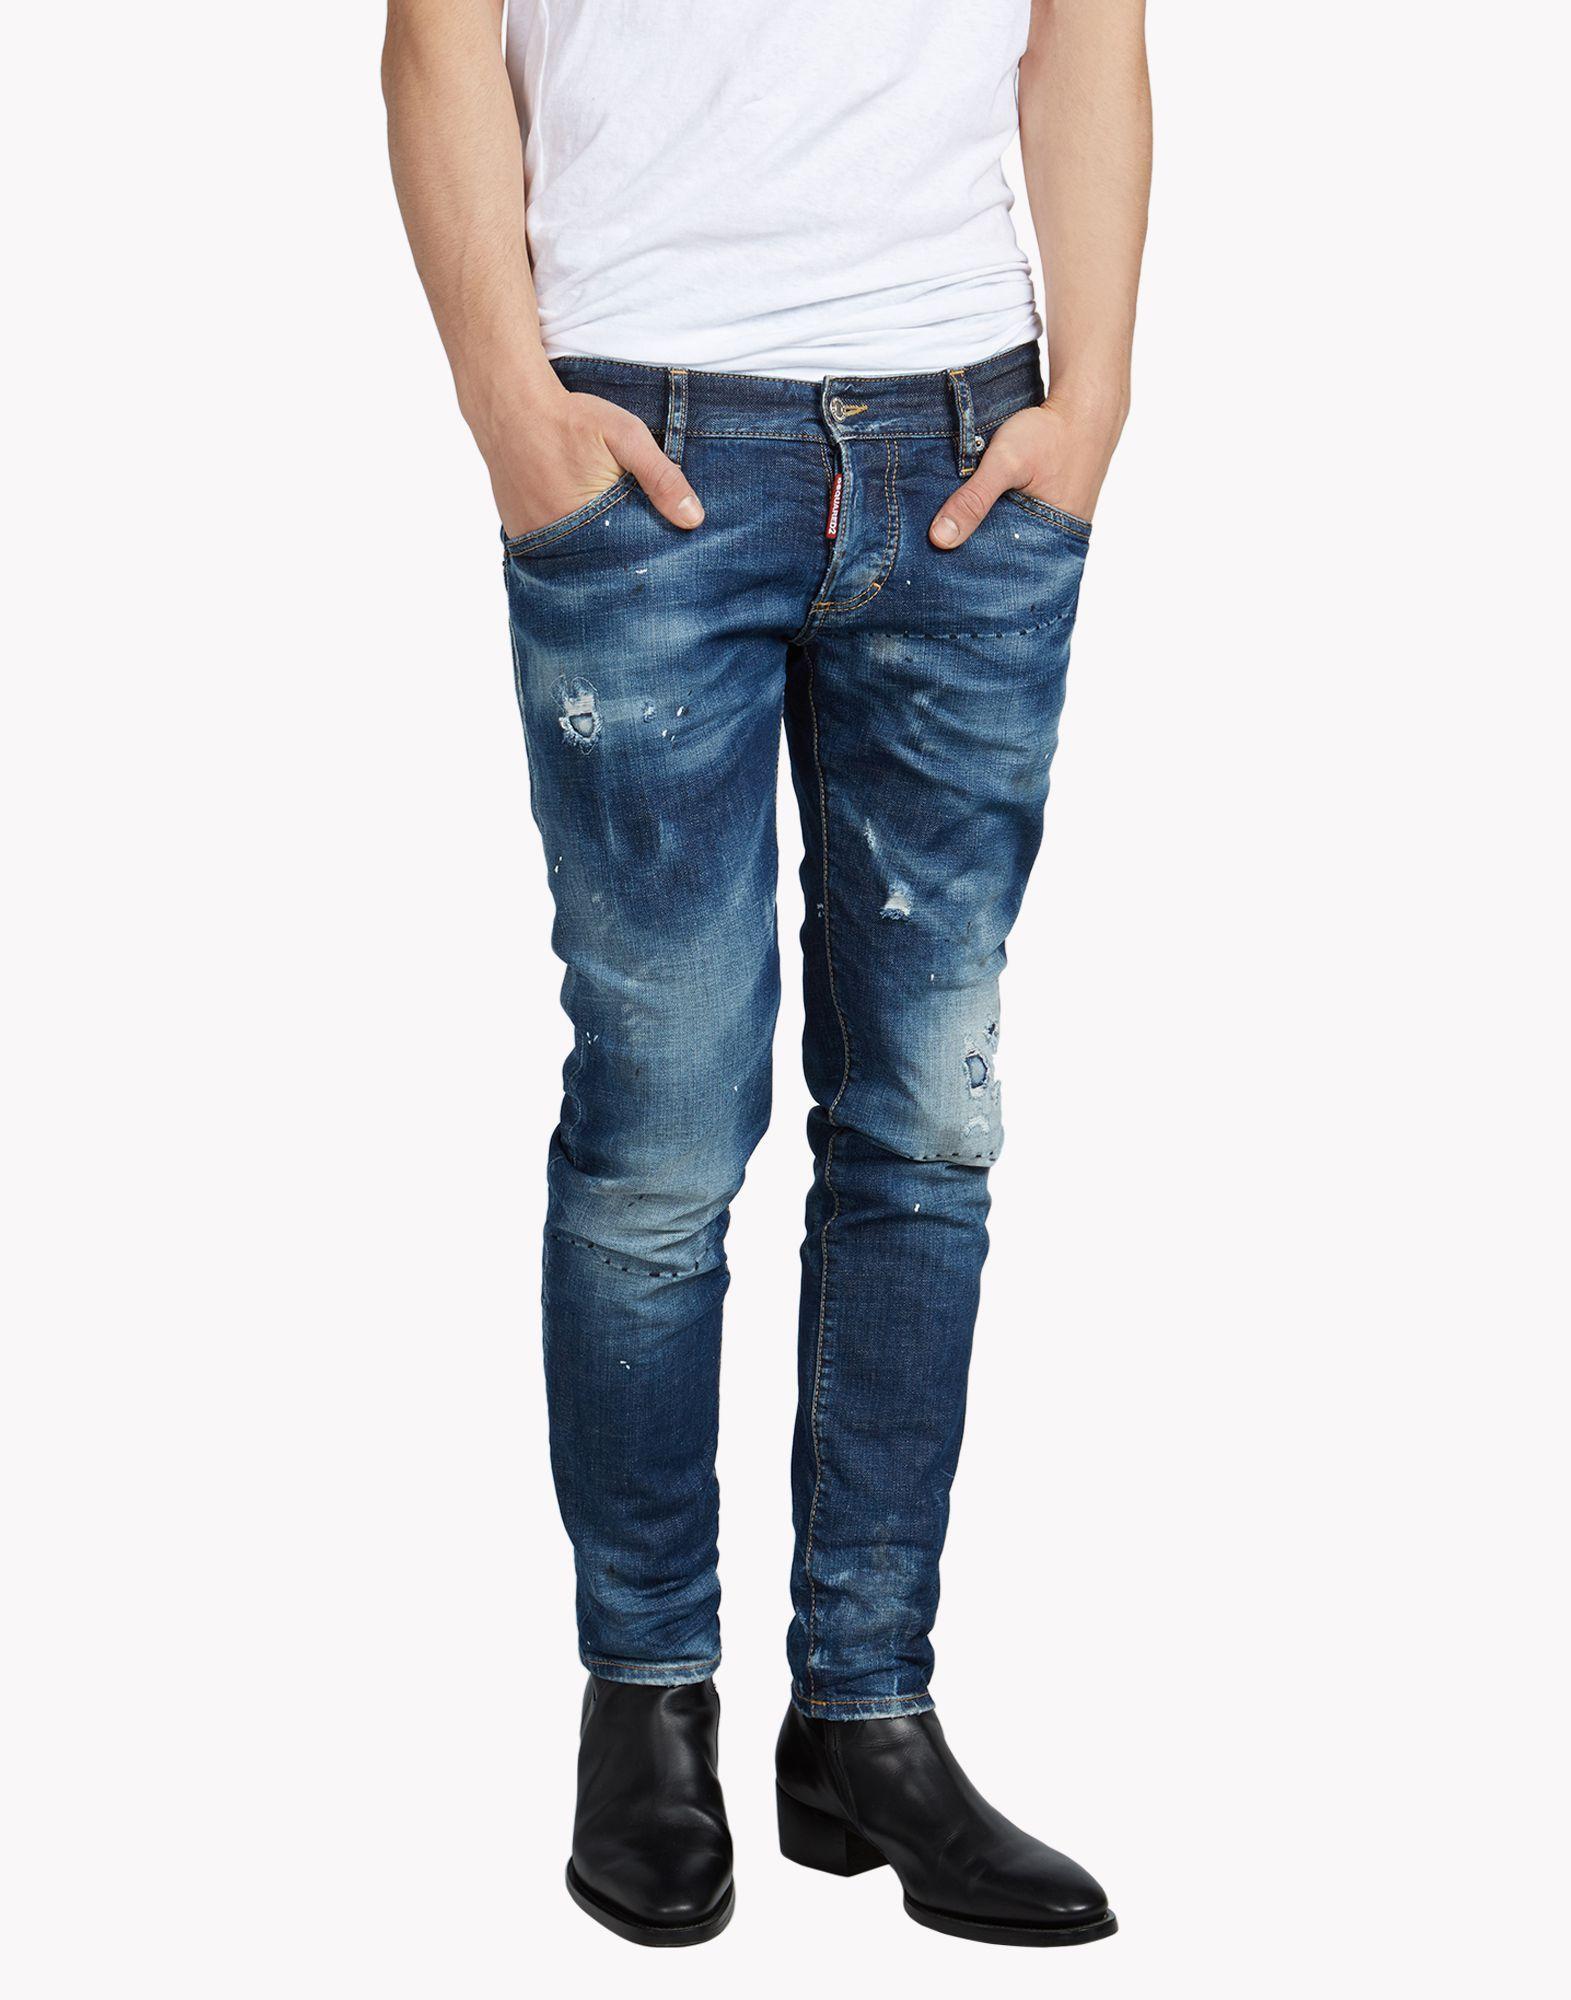 Clement Jeans - Jeans Men - Dsquared2 Official Online Store ...